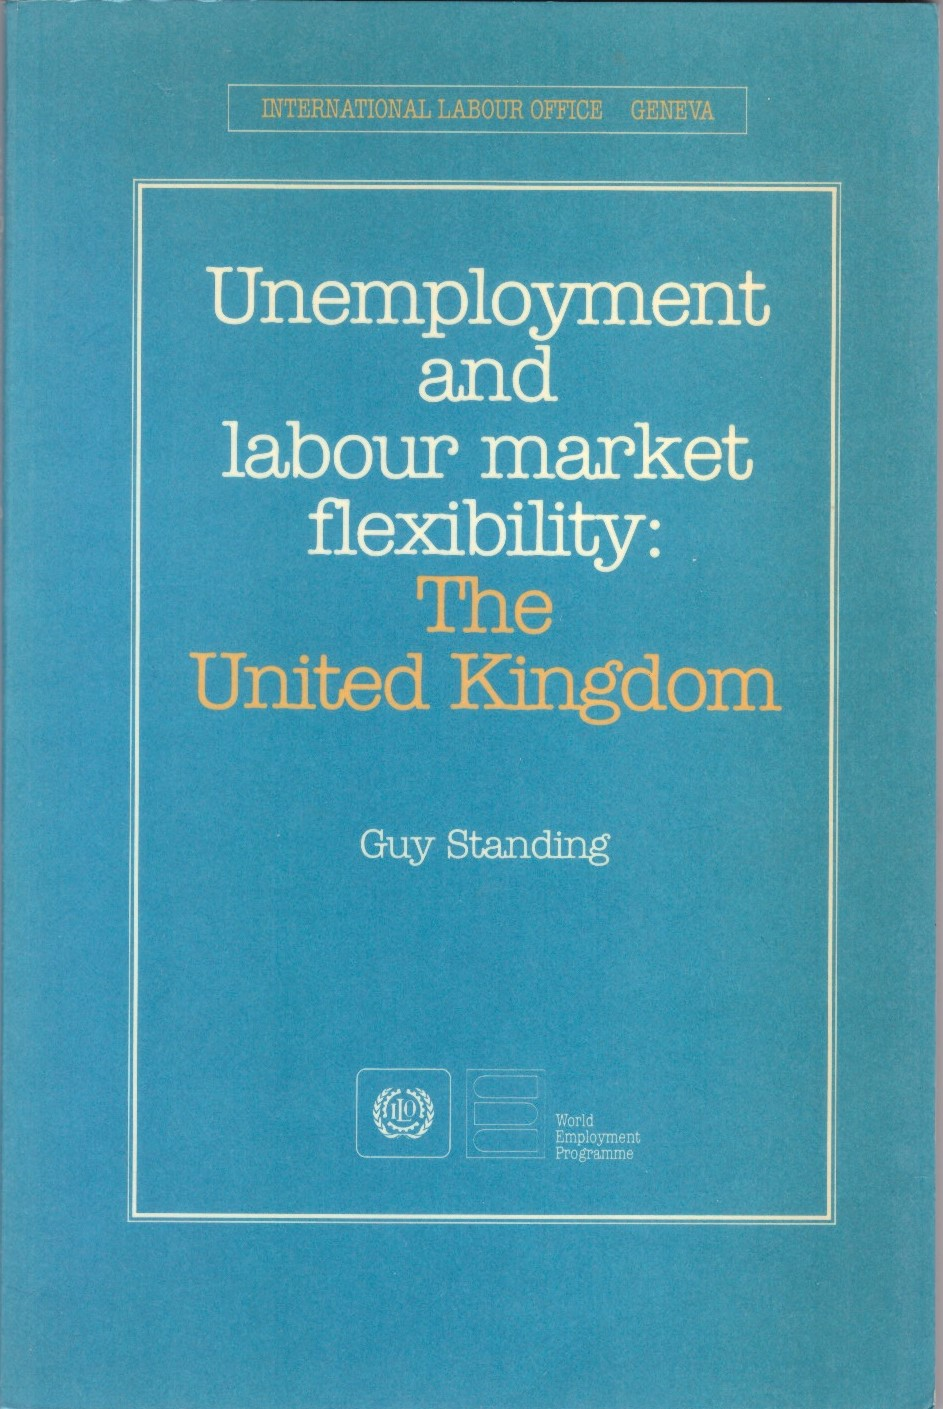 Unemployment and Labour Market Flexibility: The United Kingdom (Geneva:ILO, 1986).   Translations  ●  Details